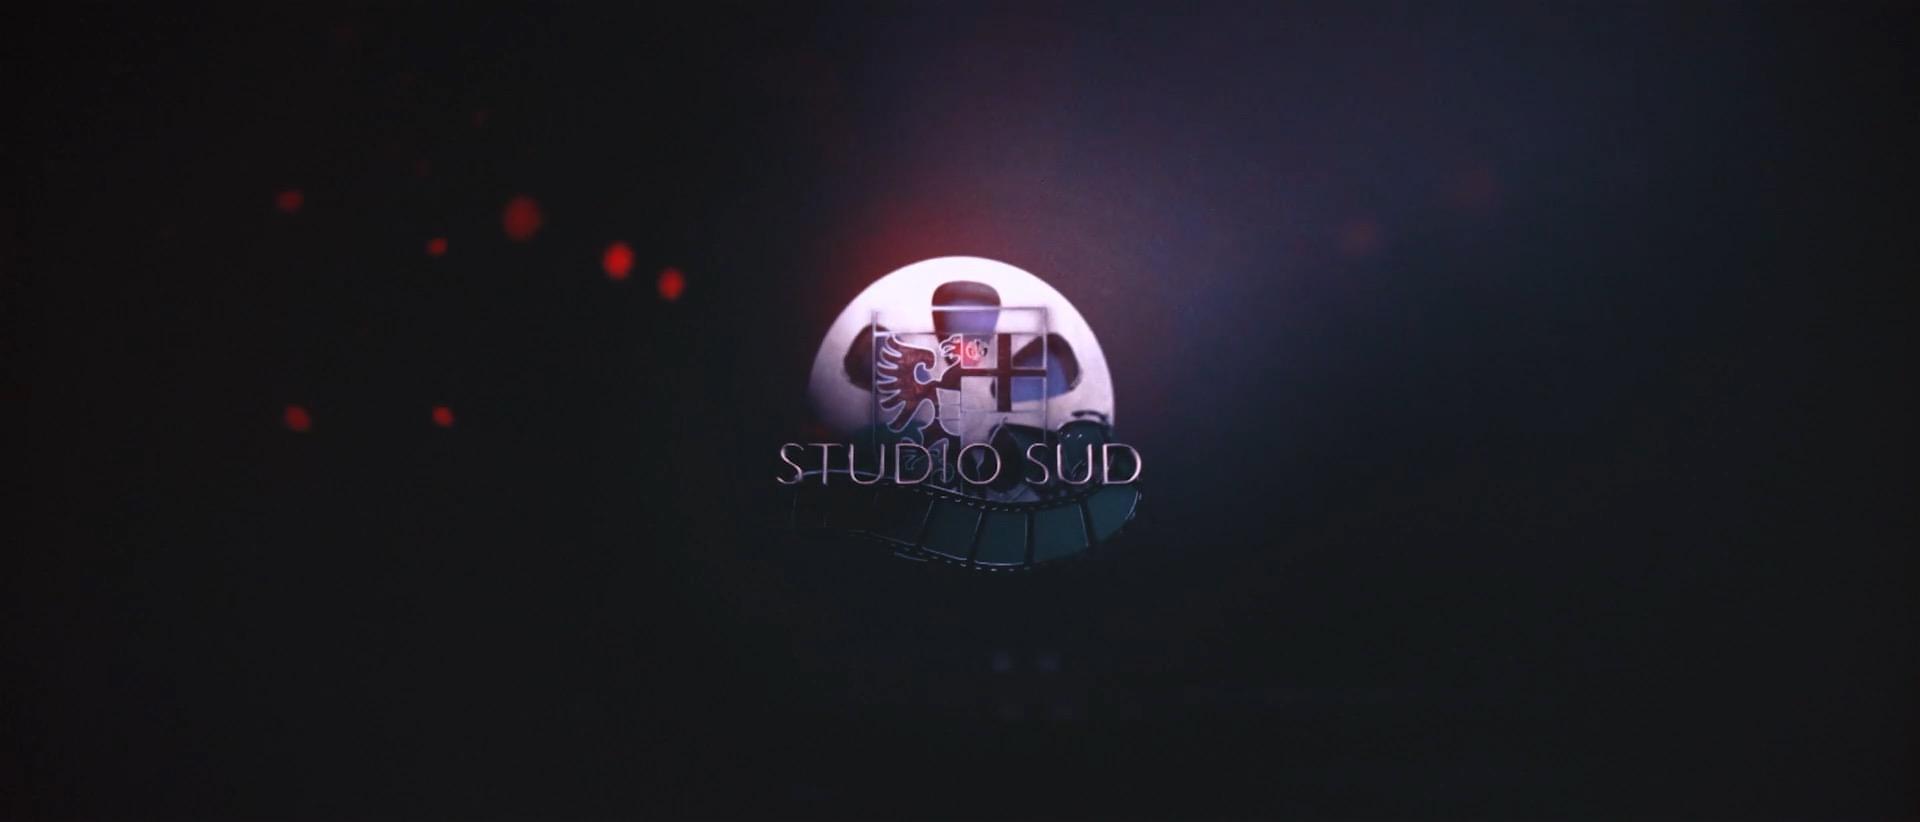 Geschützt: Lagerfilm 2019 Release